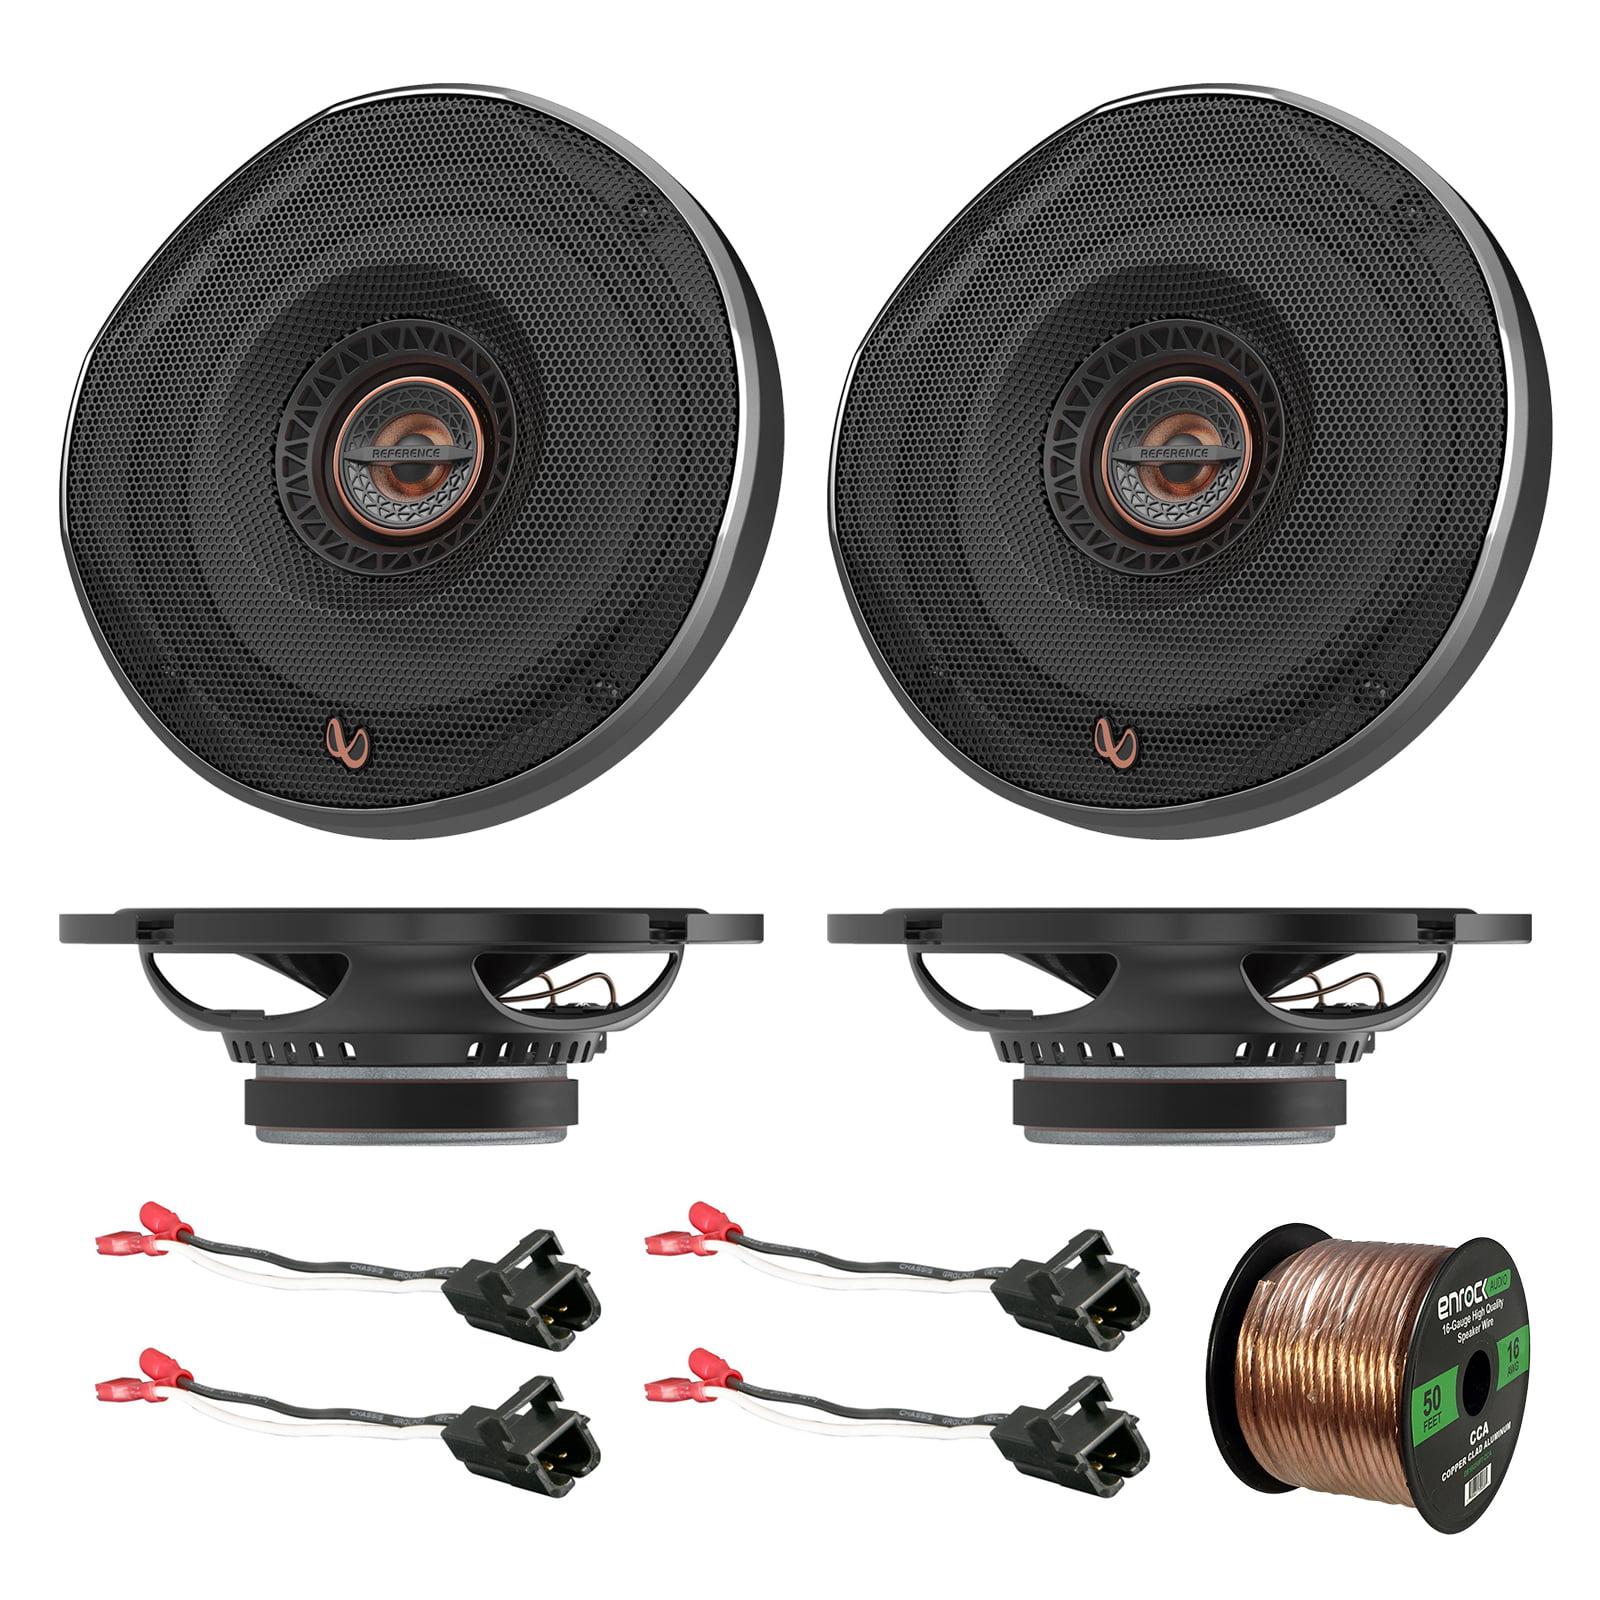 "4x Infinity REF-REF6532IX Shallow 6-1/2"" Coaxial Car Speakers, 4x Metra 72-4568 Speaker Wire Harness for Select GM Vehicles, Enrock Audio 16-Gauge 50 Foot Speaker Wire"